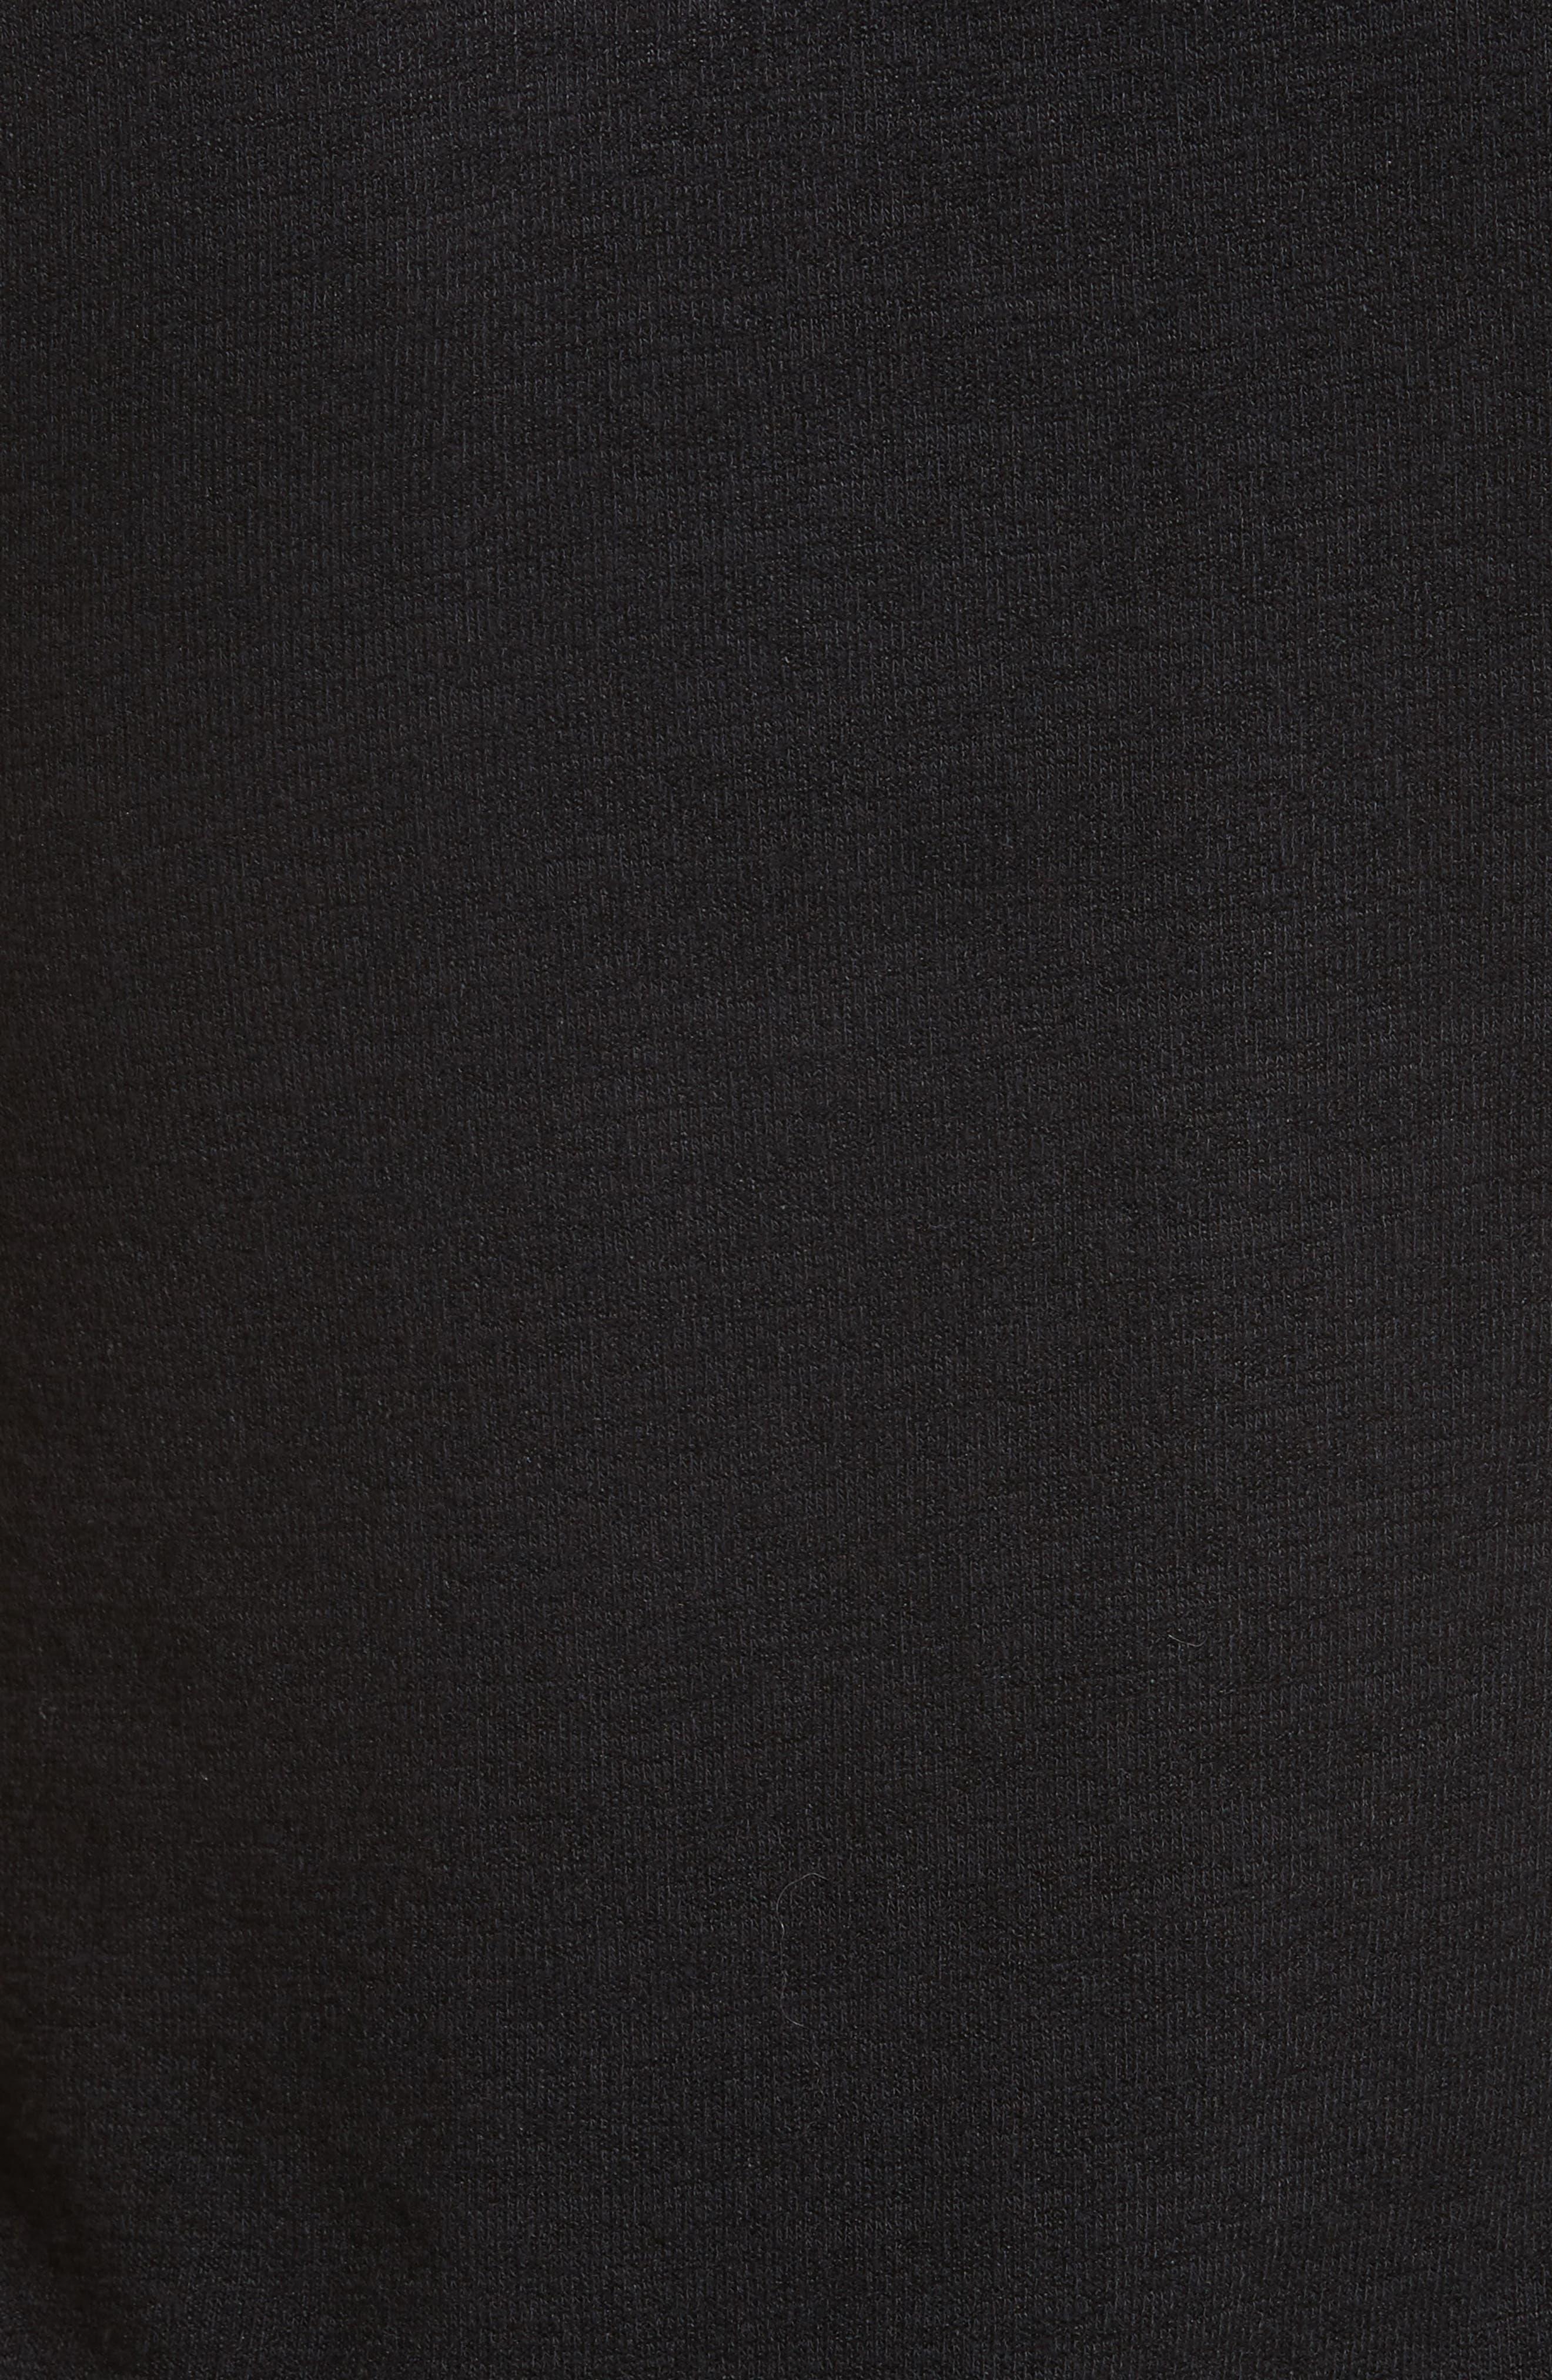 Amelie Mock Neck Tank,                             Alternate thumbnail 5, color,                             Black